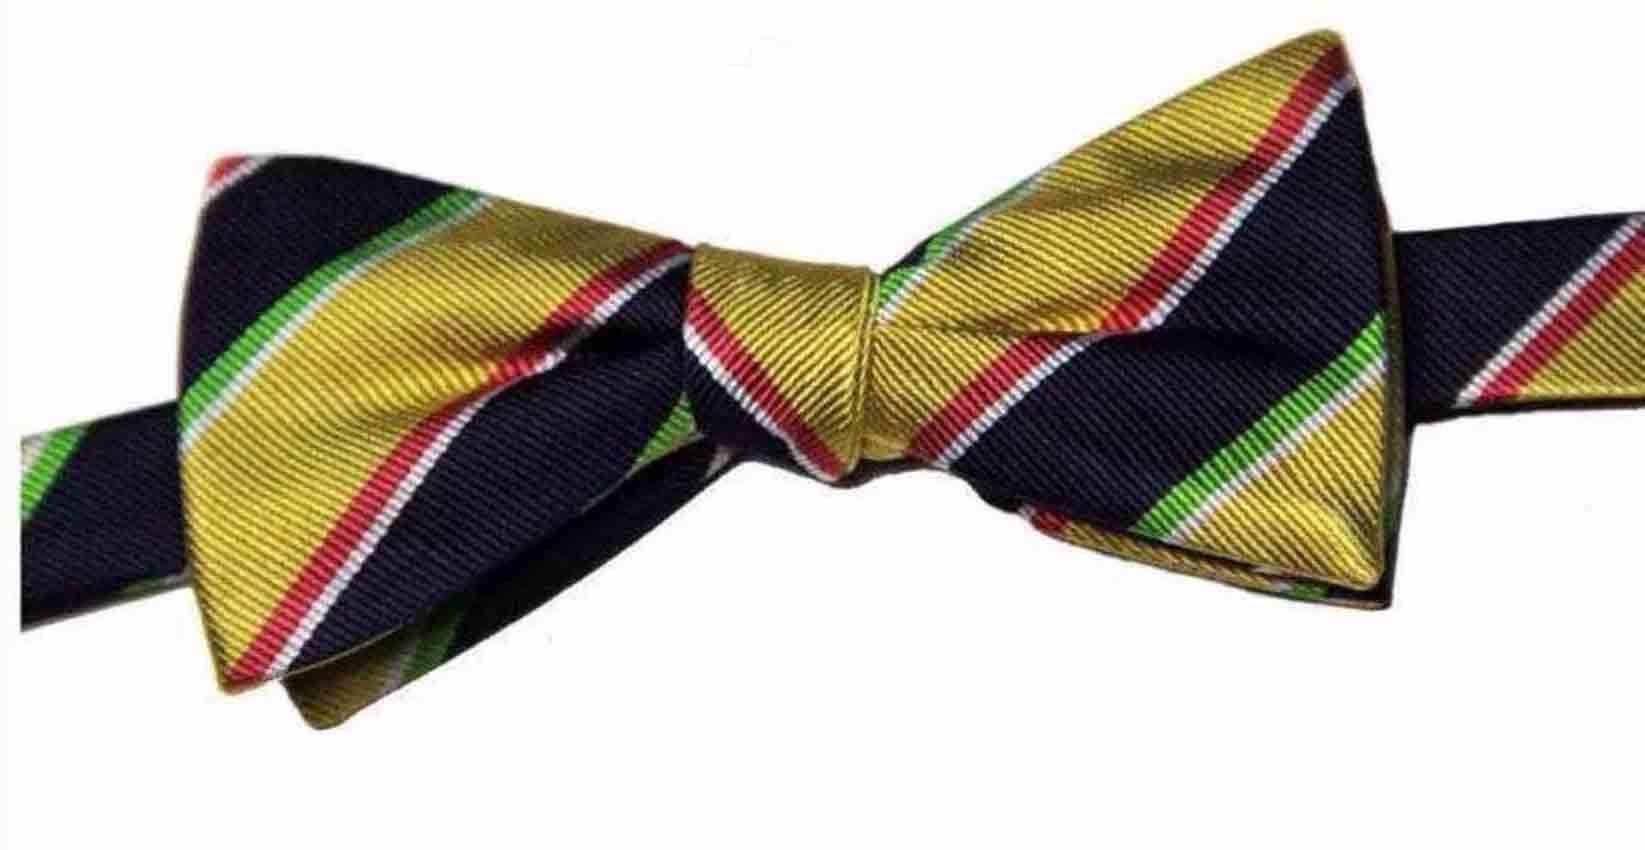 Countess Mara Regimental Stripe Bow Tie Gold Blue Red White Men's